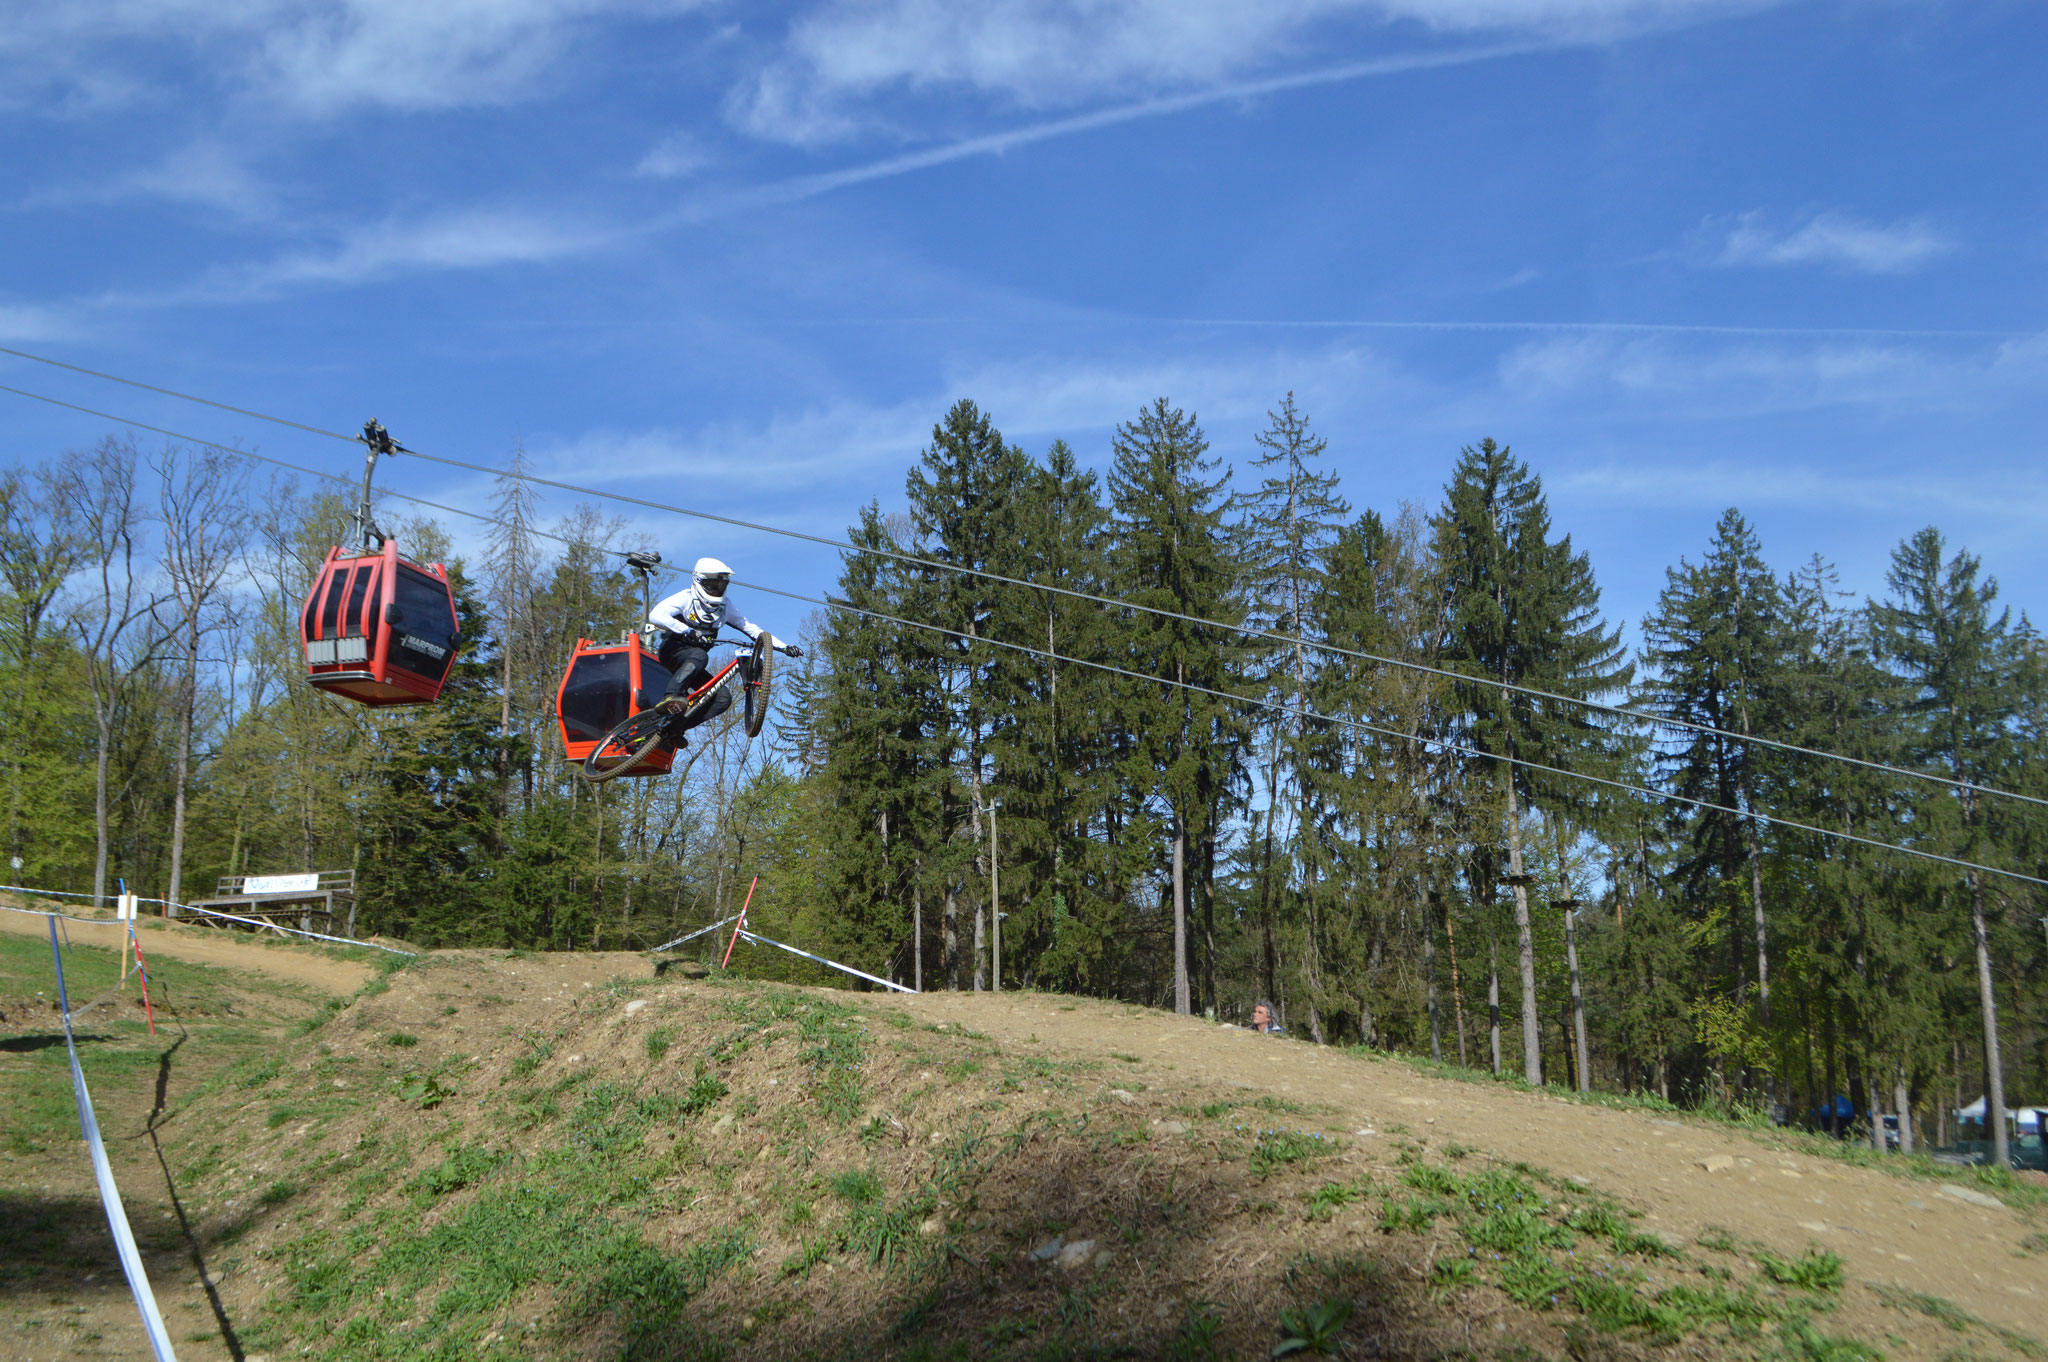 European Downhill Cup Maribor